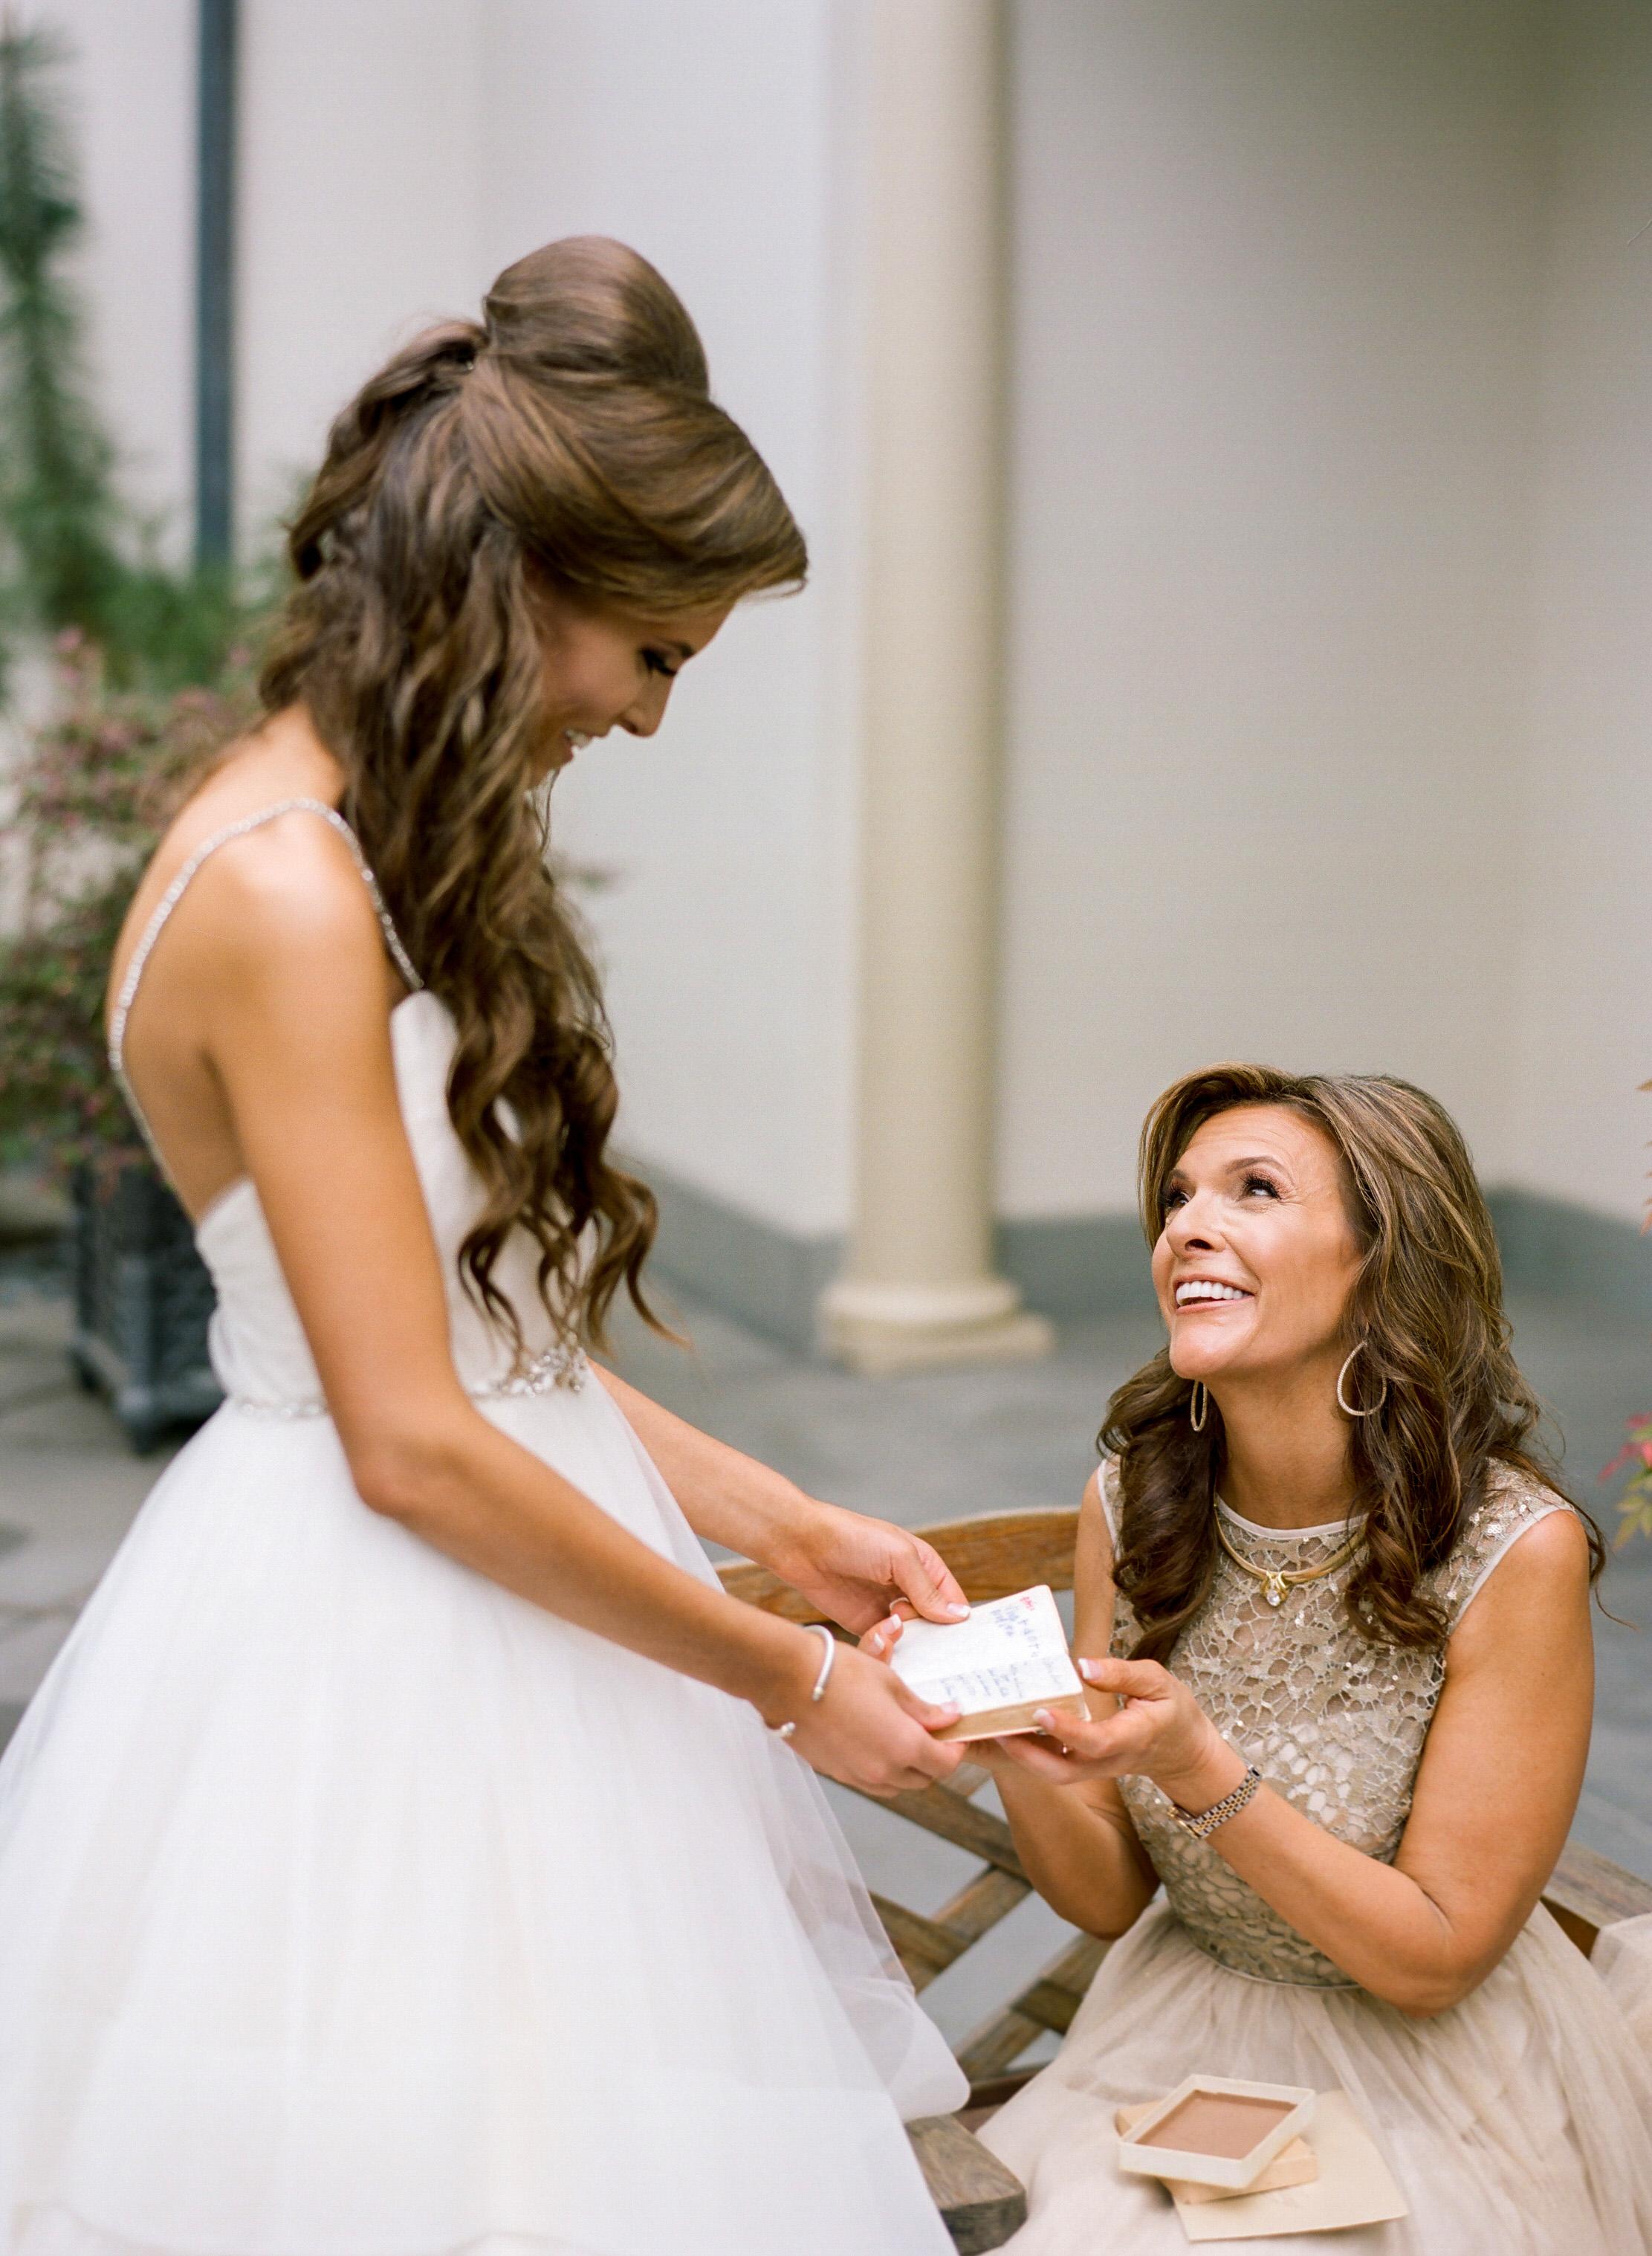 Dana-Fernandez-Photography-Weddings-in-Houston-Magazine-feature-Houston-wedding-photographer-film-13.jpg